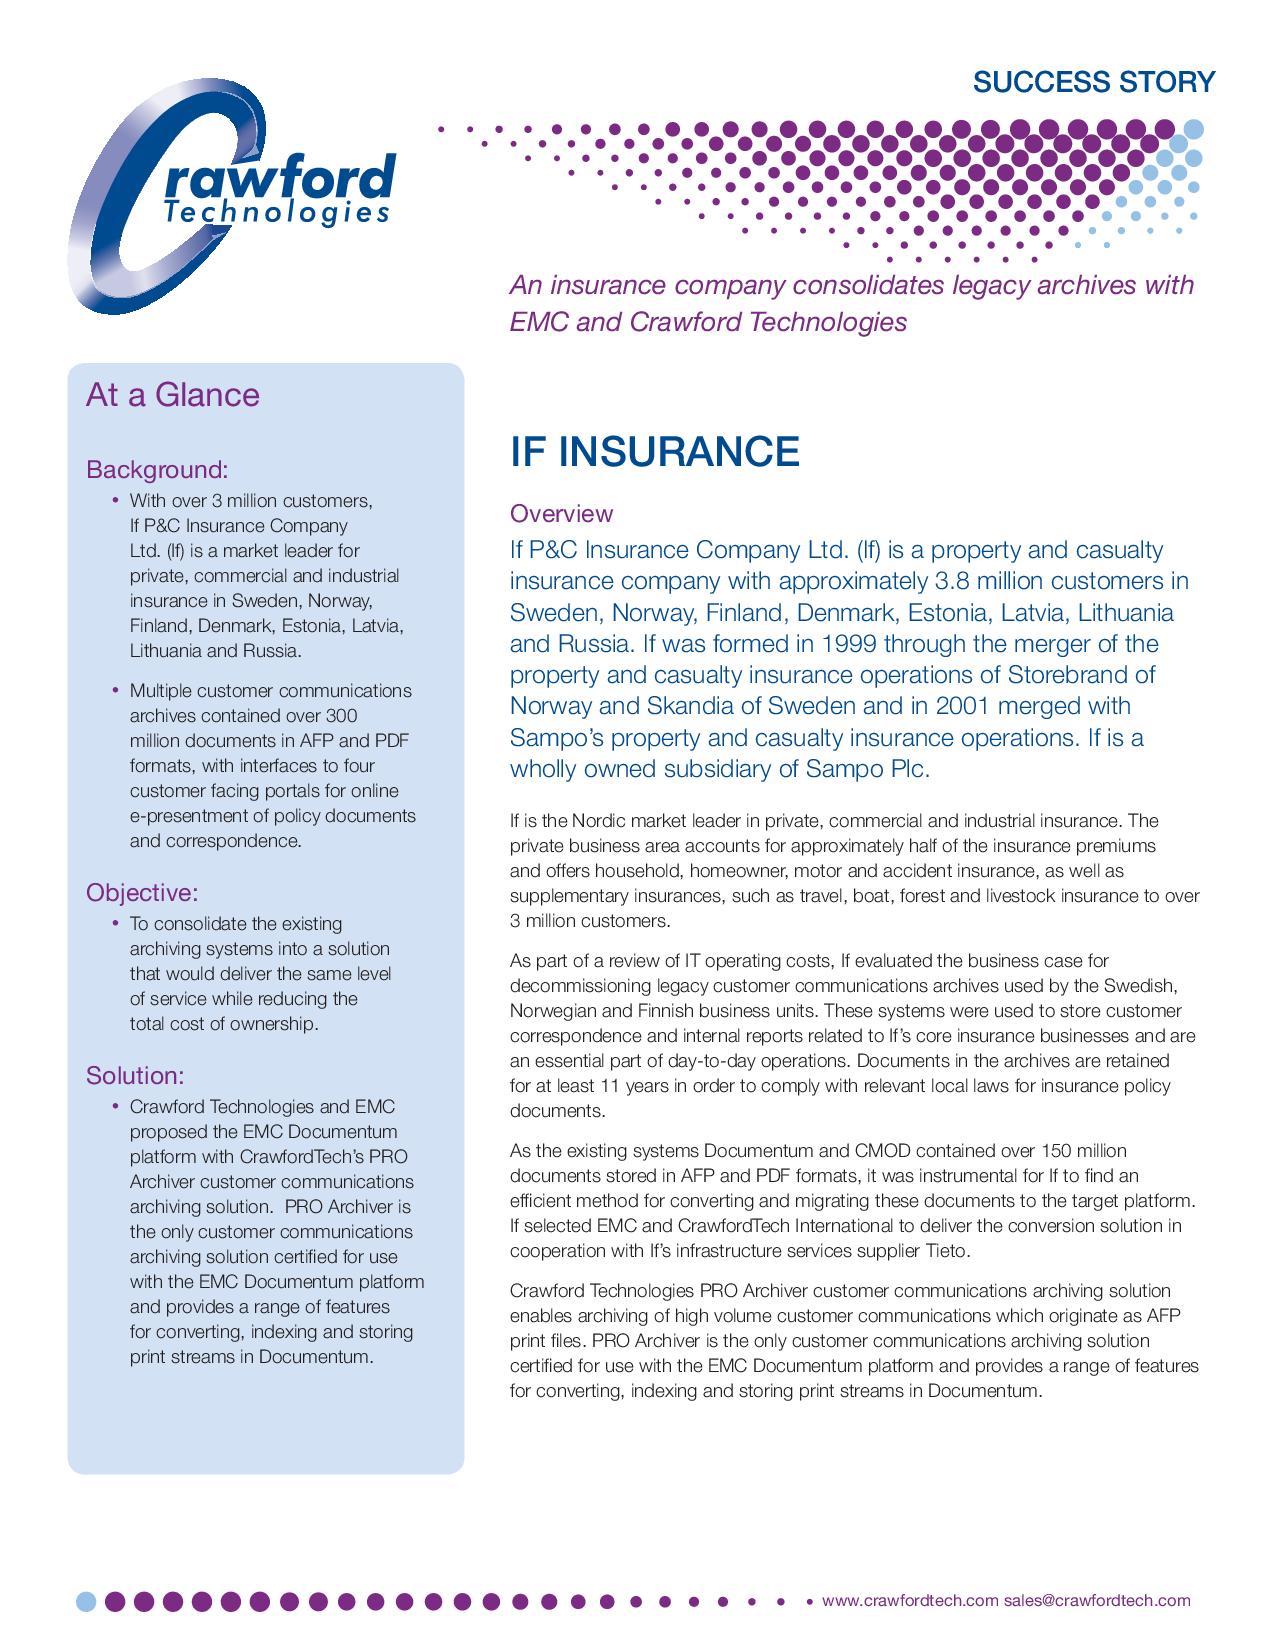 IF Insurance